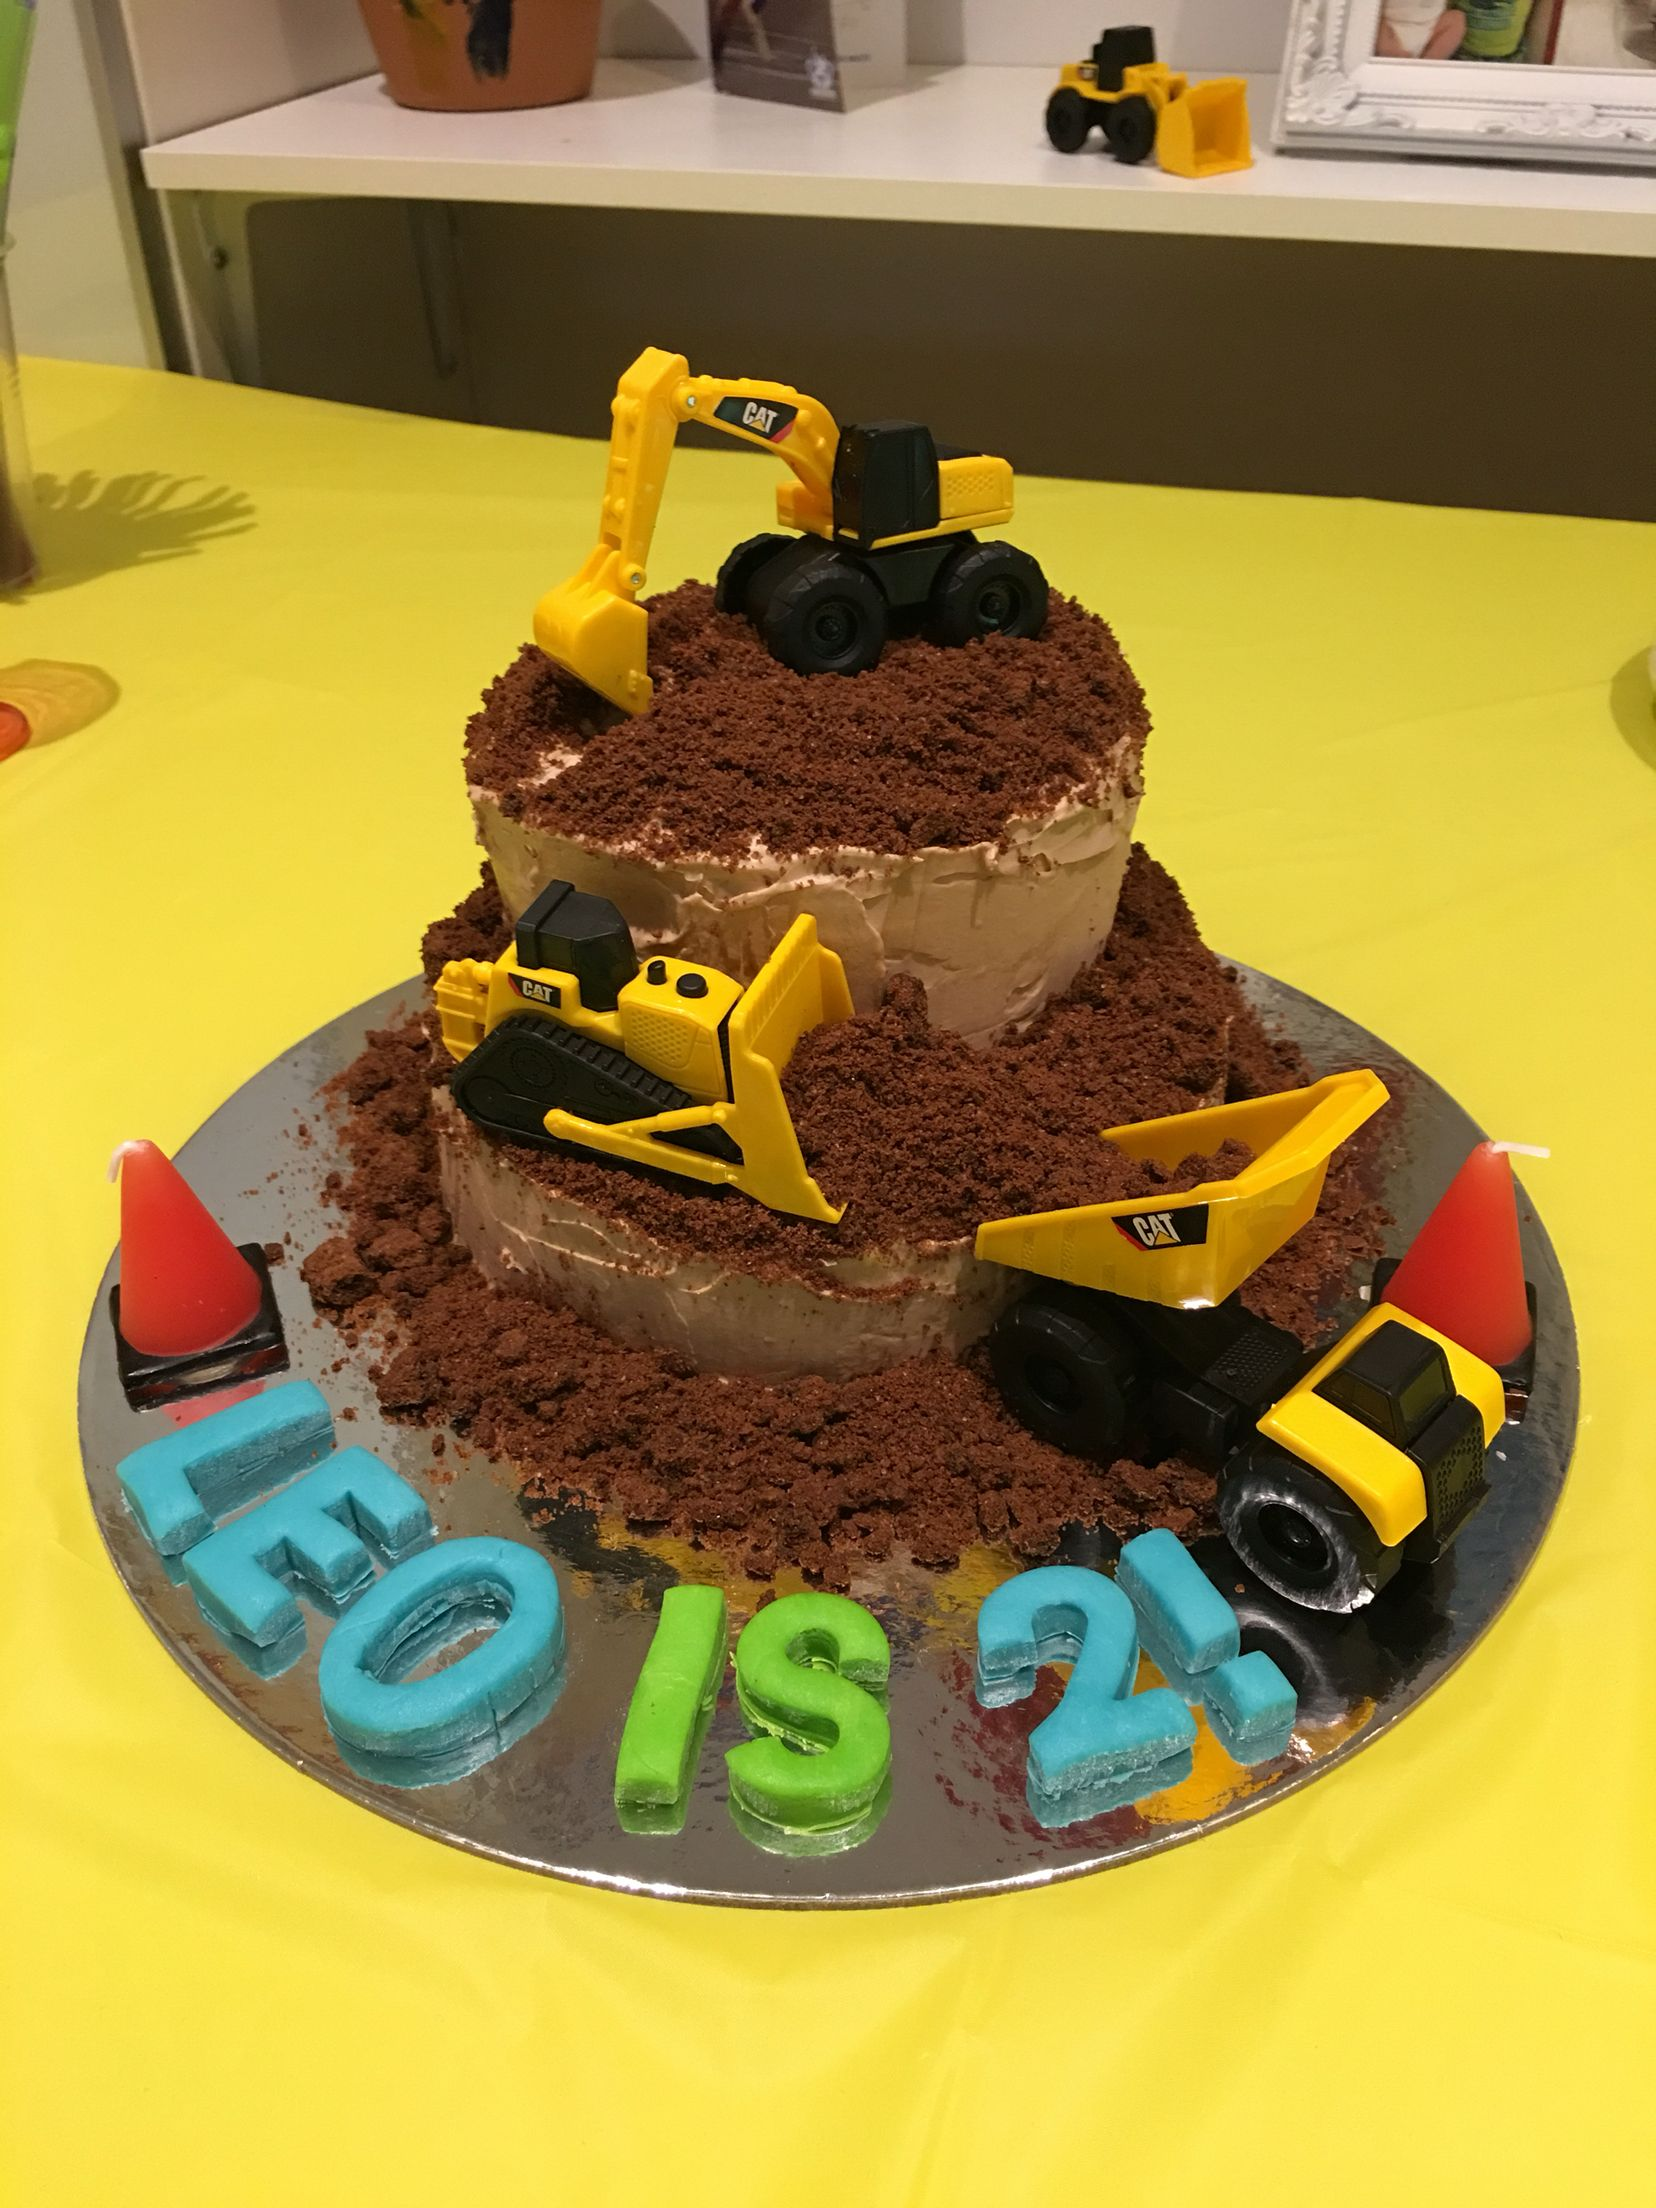 Digger Excavator Cake More 4 Year Old Boy Pinterest